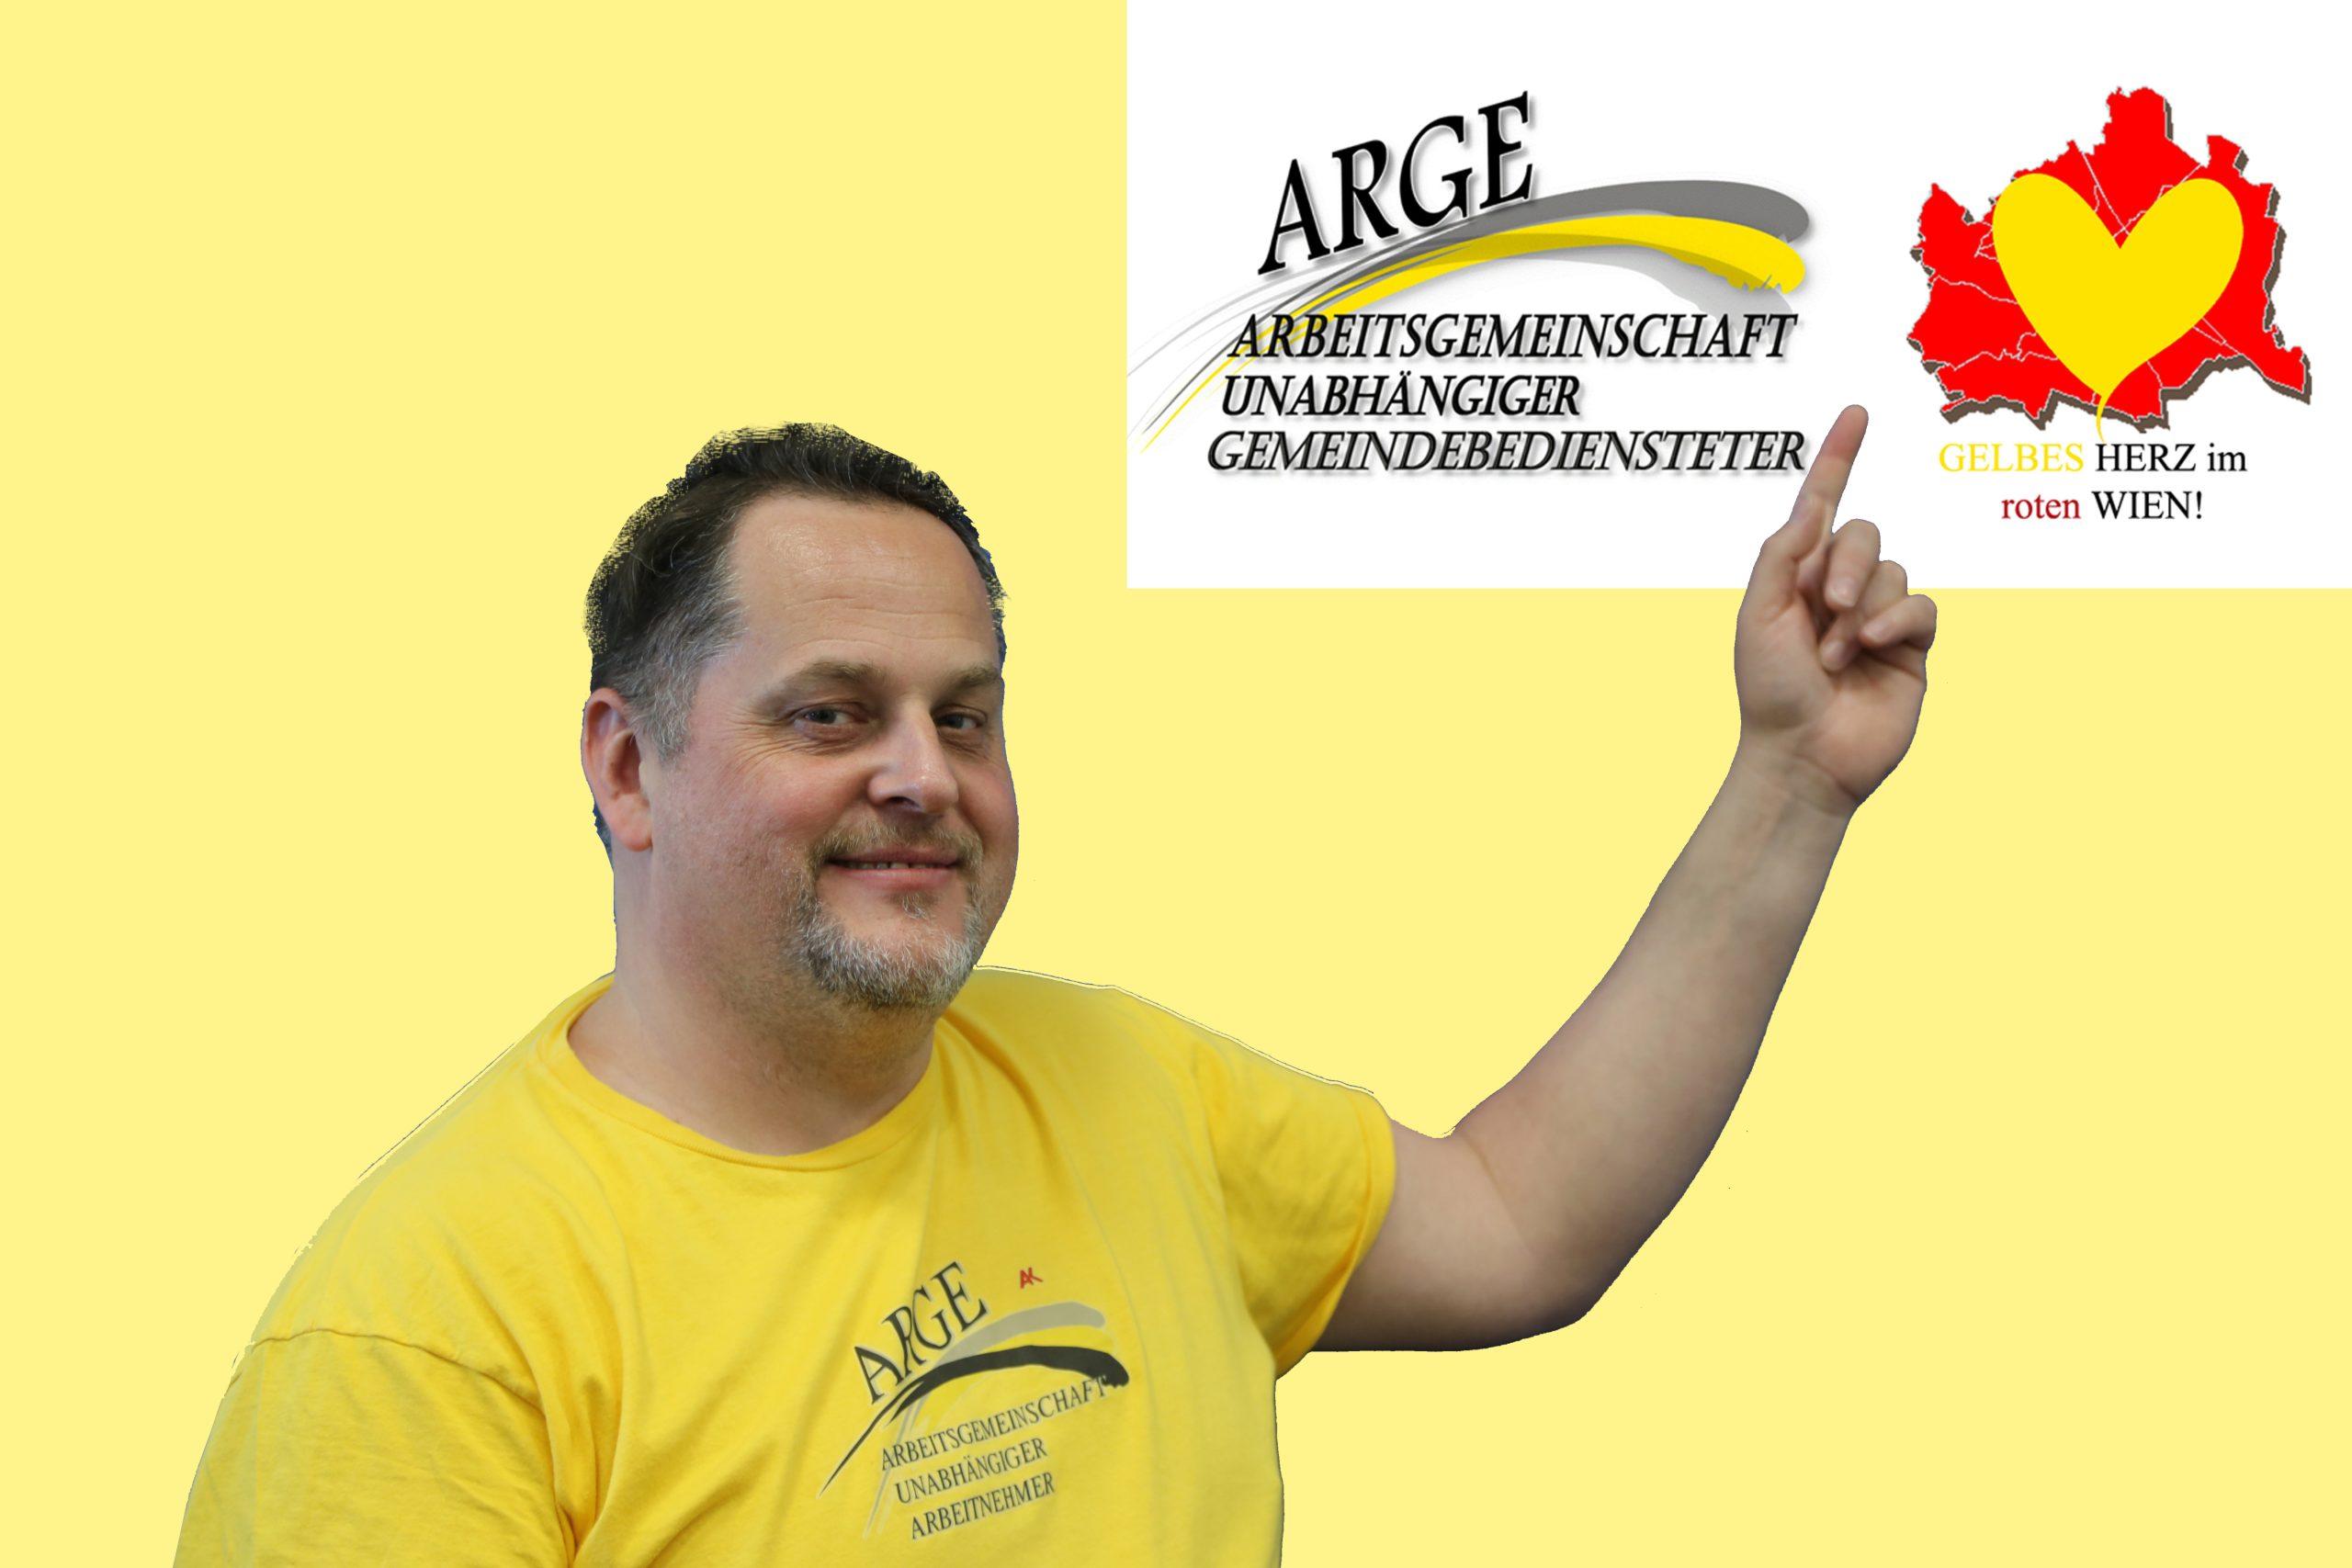 Andreas und das Logo